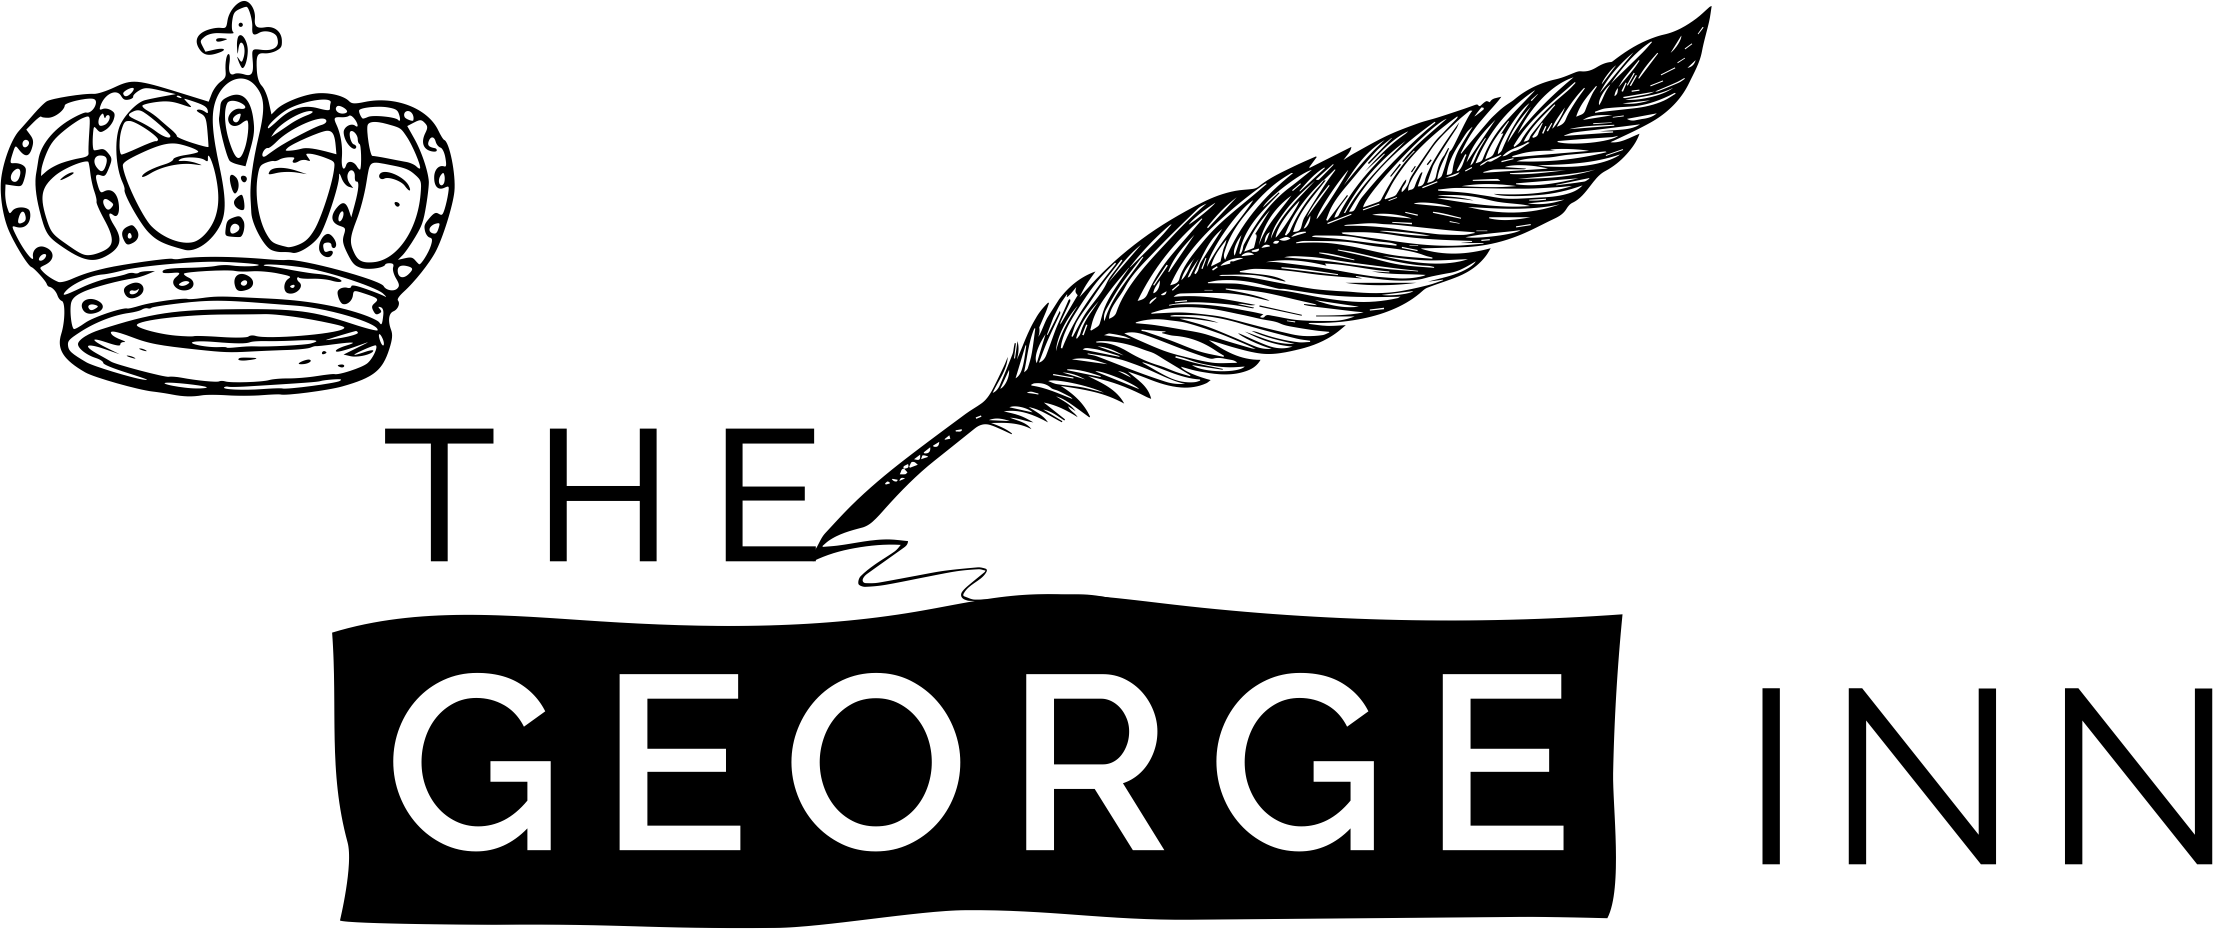 Logo of The George Inn - Upham Pub Co.